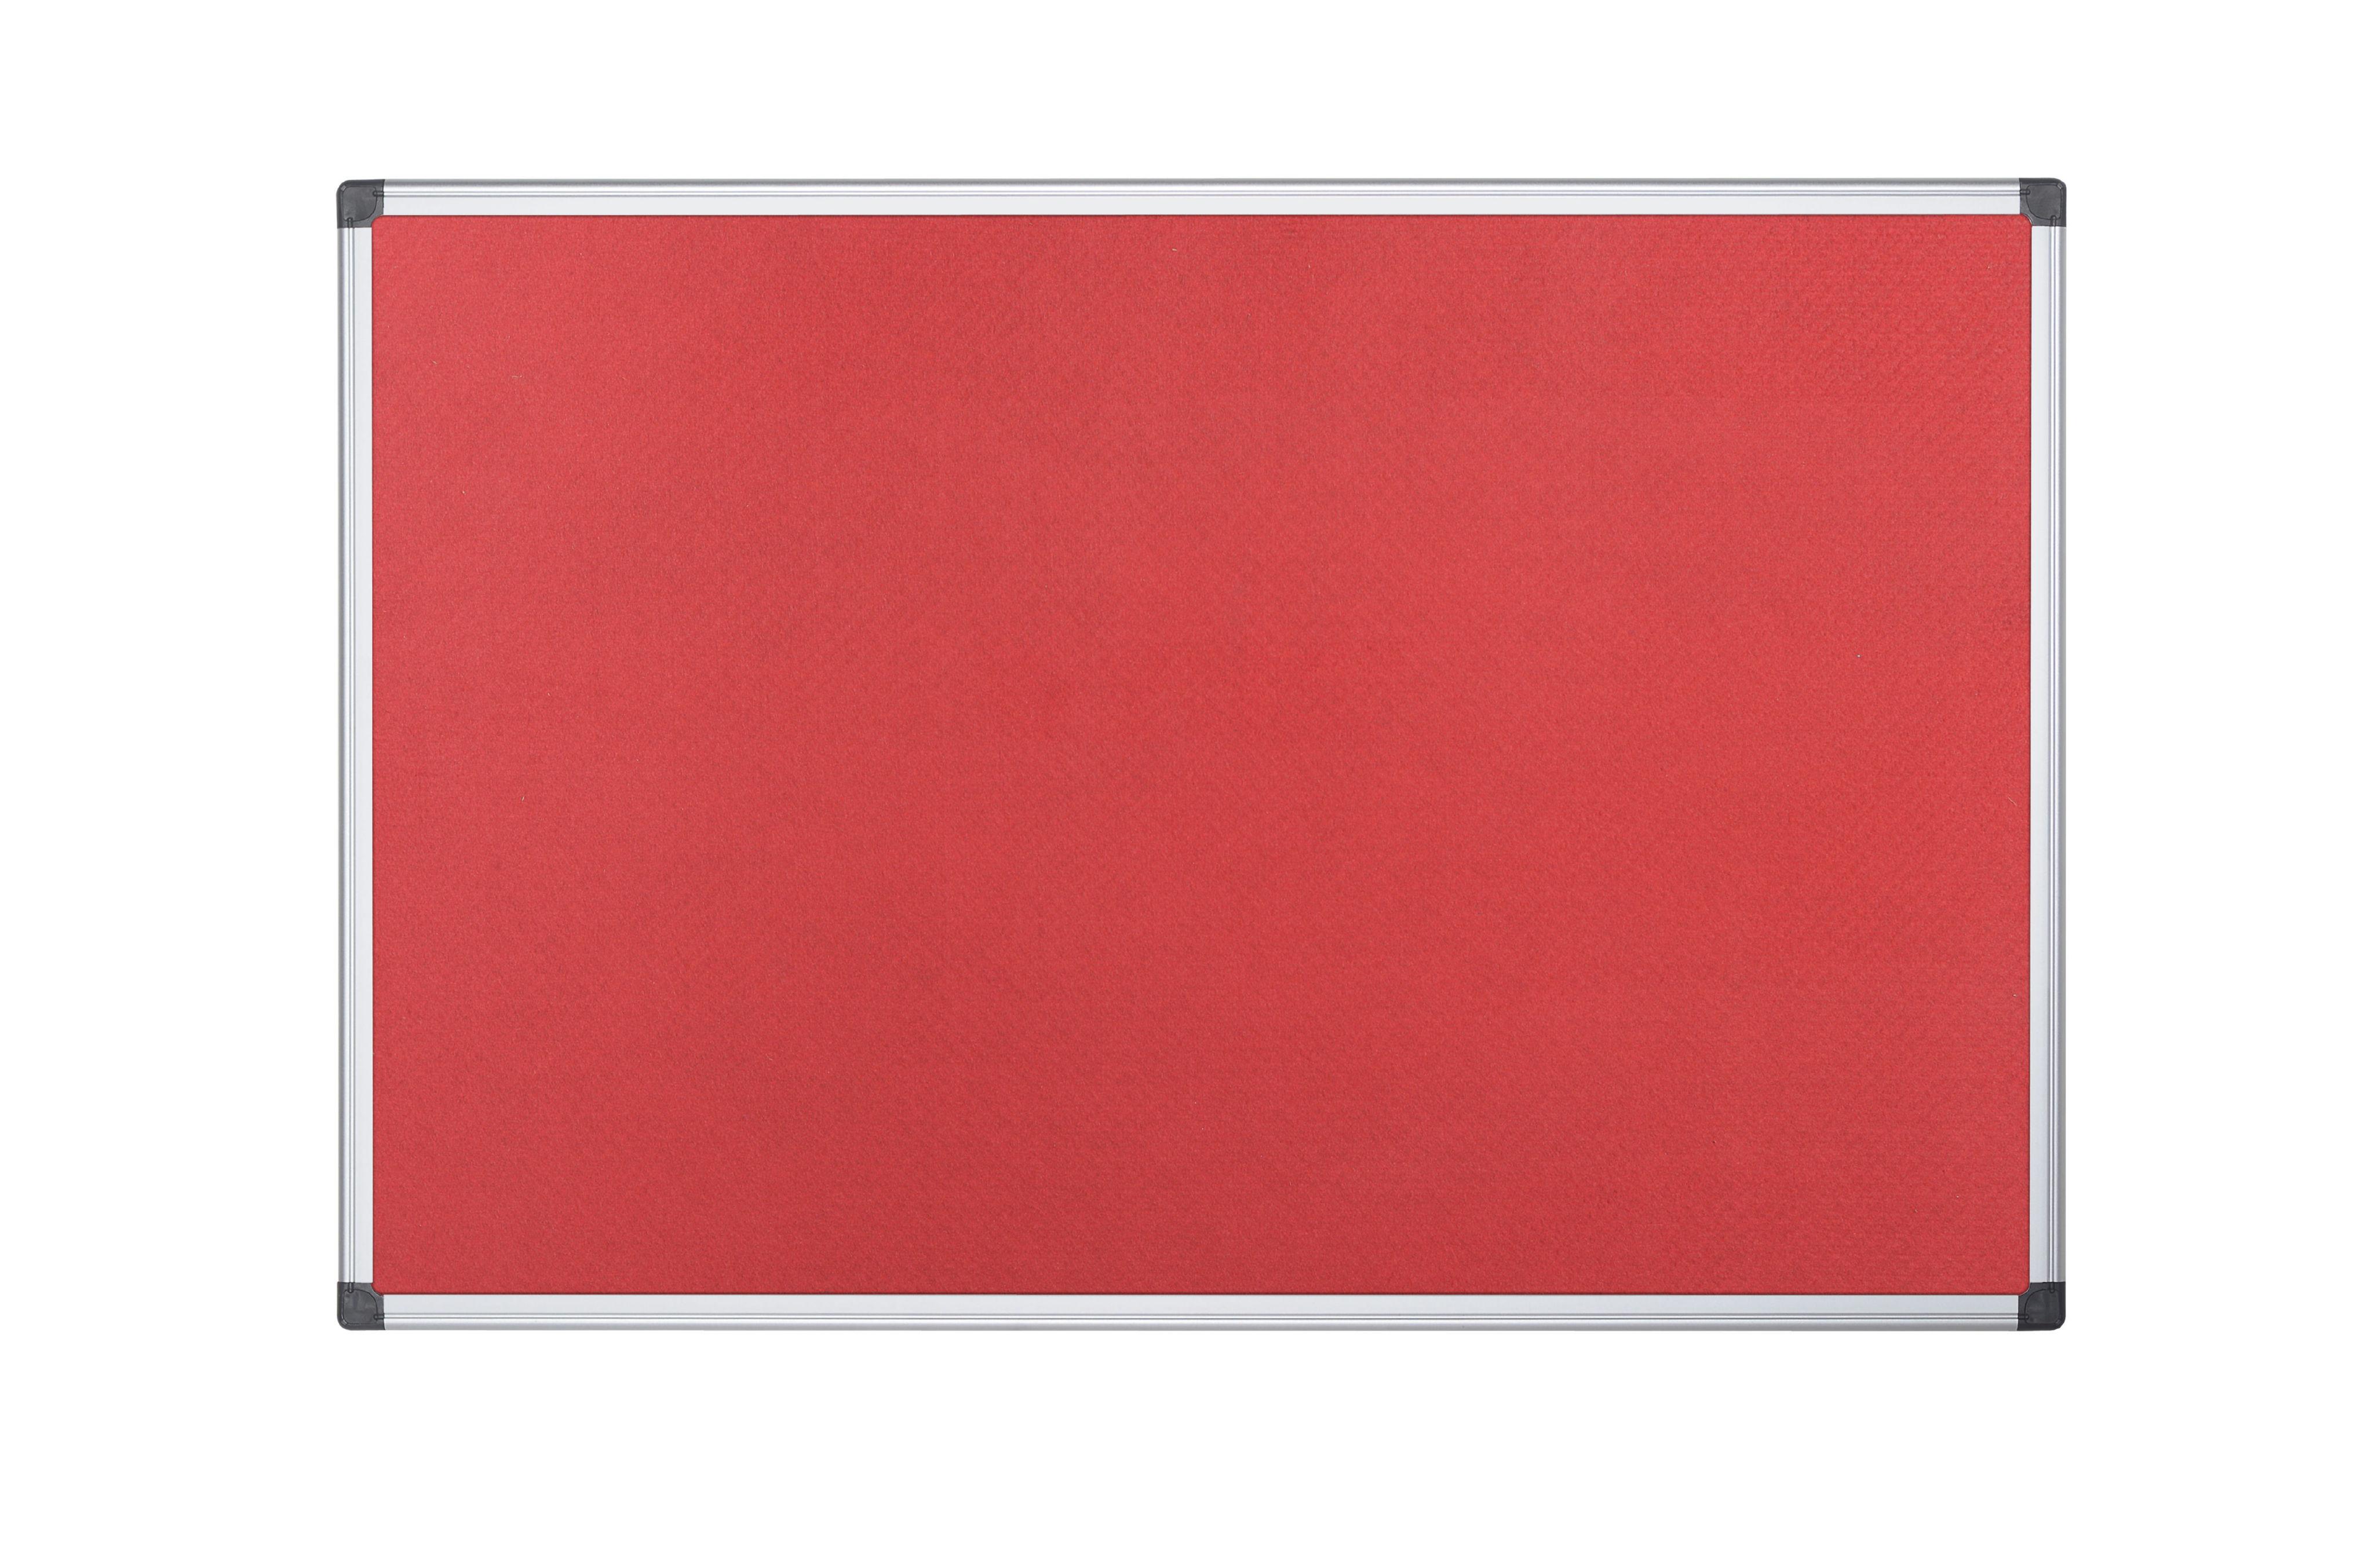 Felt Bi-Office Maya Red Felt Noticeboard Aluminium Frame 2400x1200mm